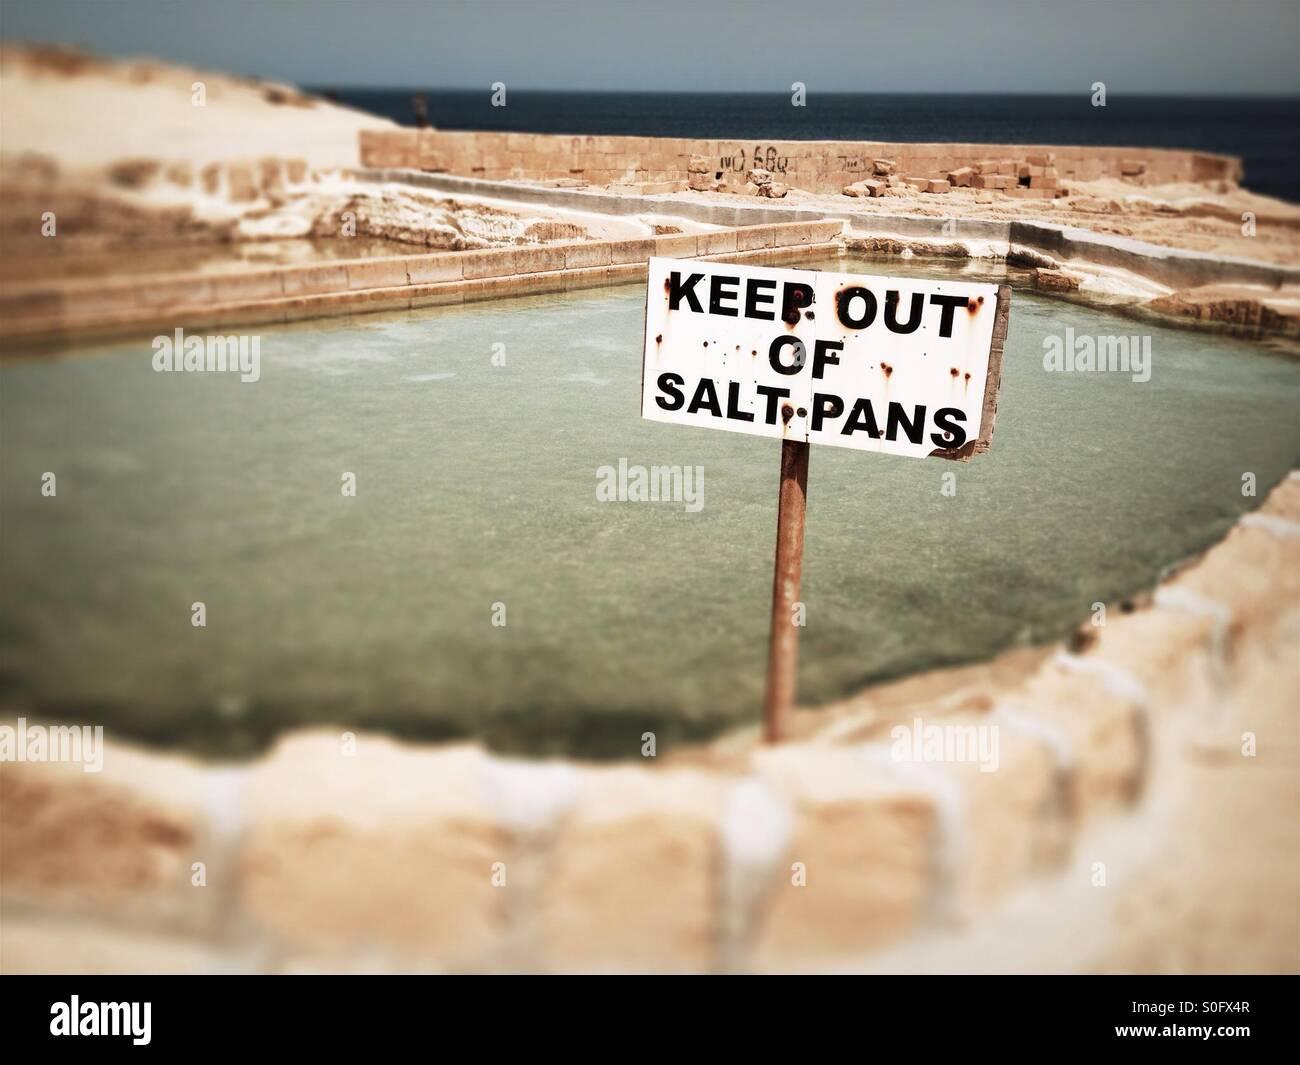 Salt pans keep out, Gozo, Malta. - Stock Image